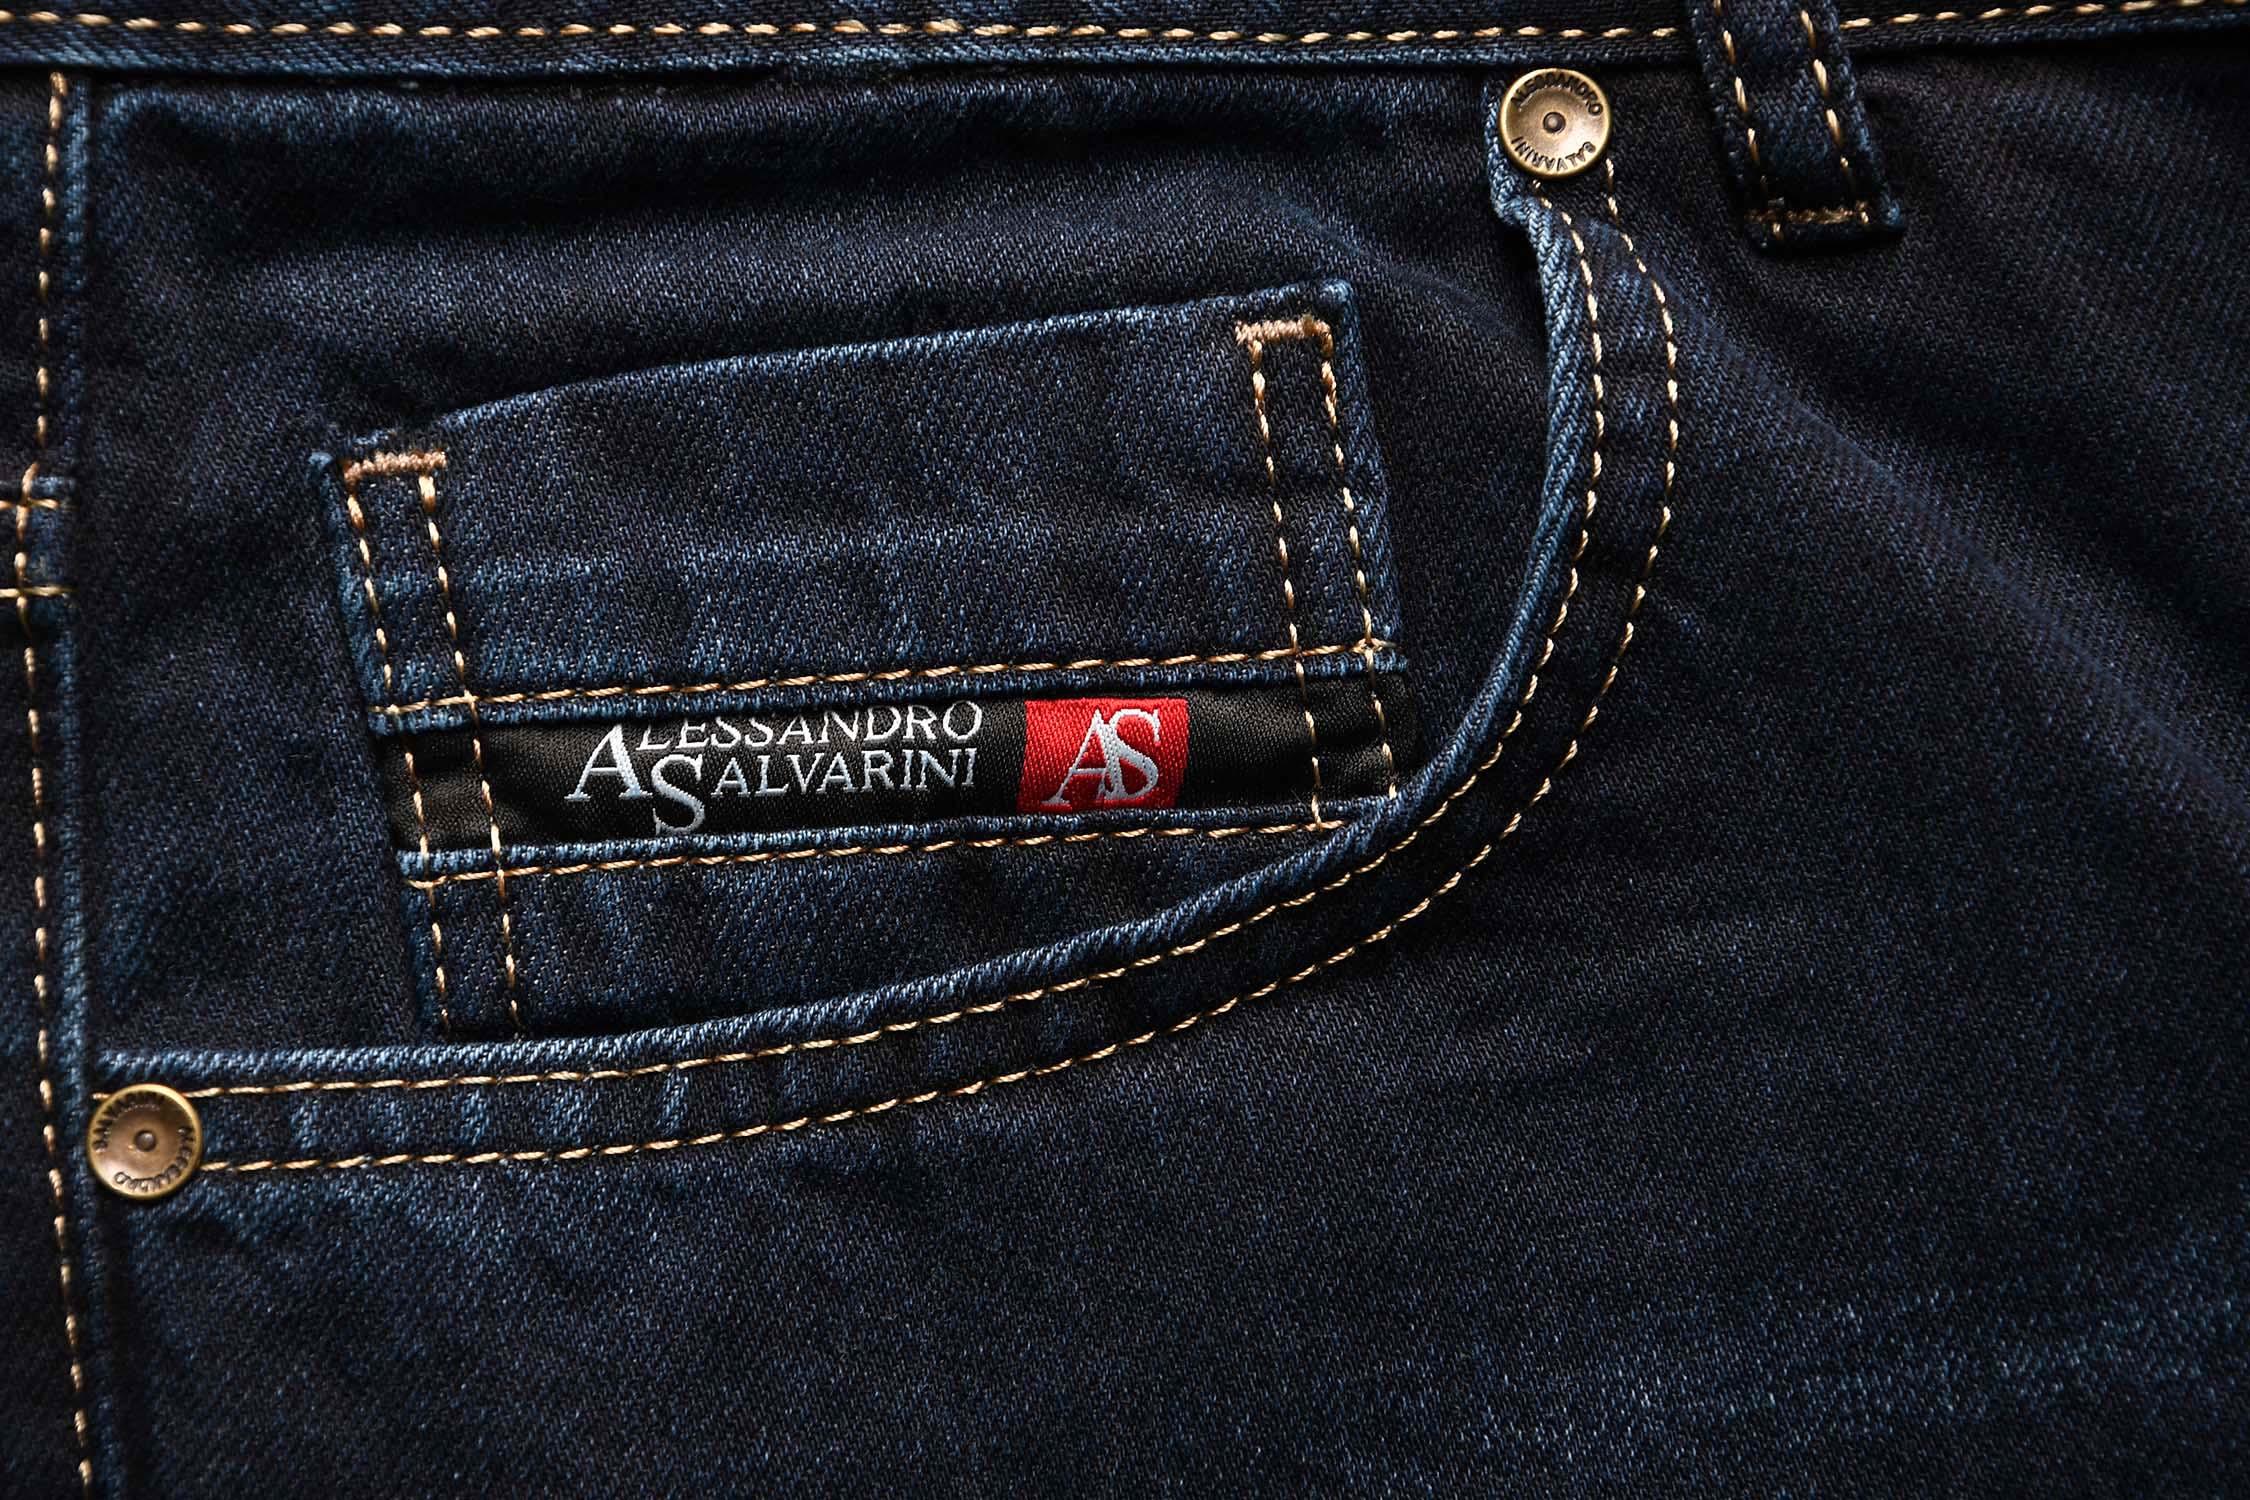 A-Salvarini-Beppo-Designer-Herren-Jeans-Hose-Basic-Jeanshose-Comfort-Fit Indexbild 23